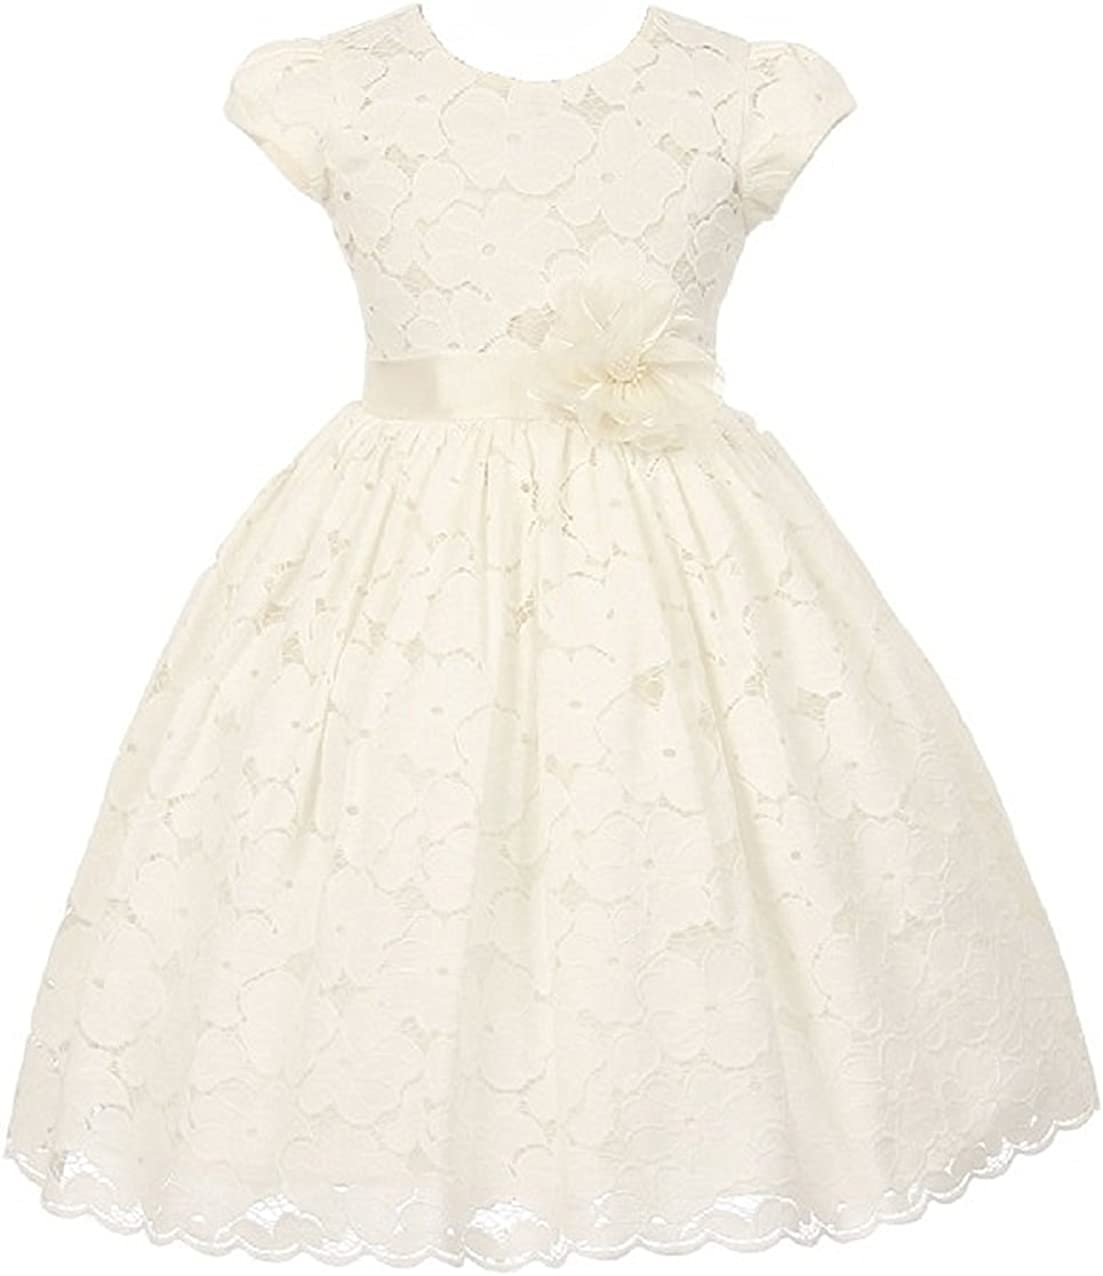 iGirlDress Little Girls Short Sleeve Cotton Floral Lace Flower Girl Dress (4-14)